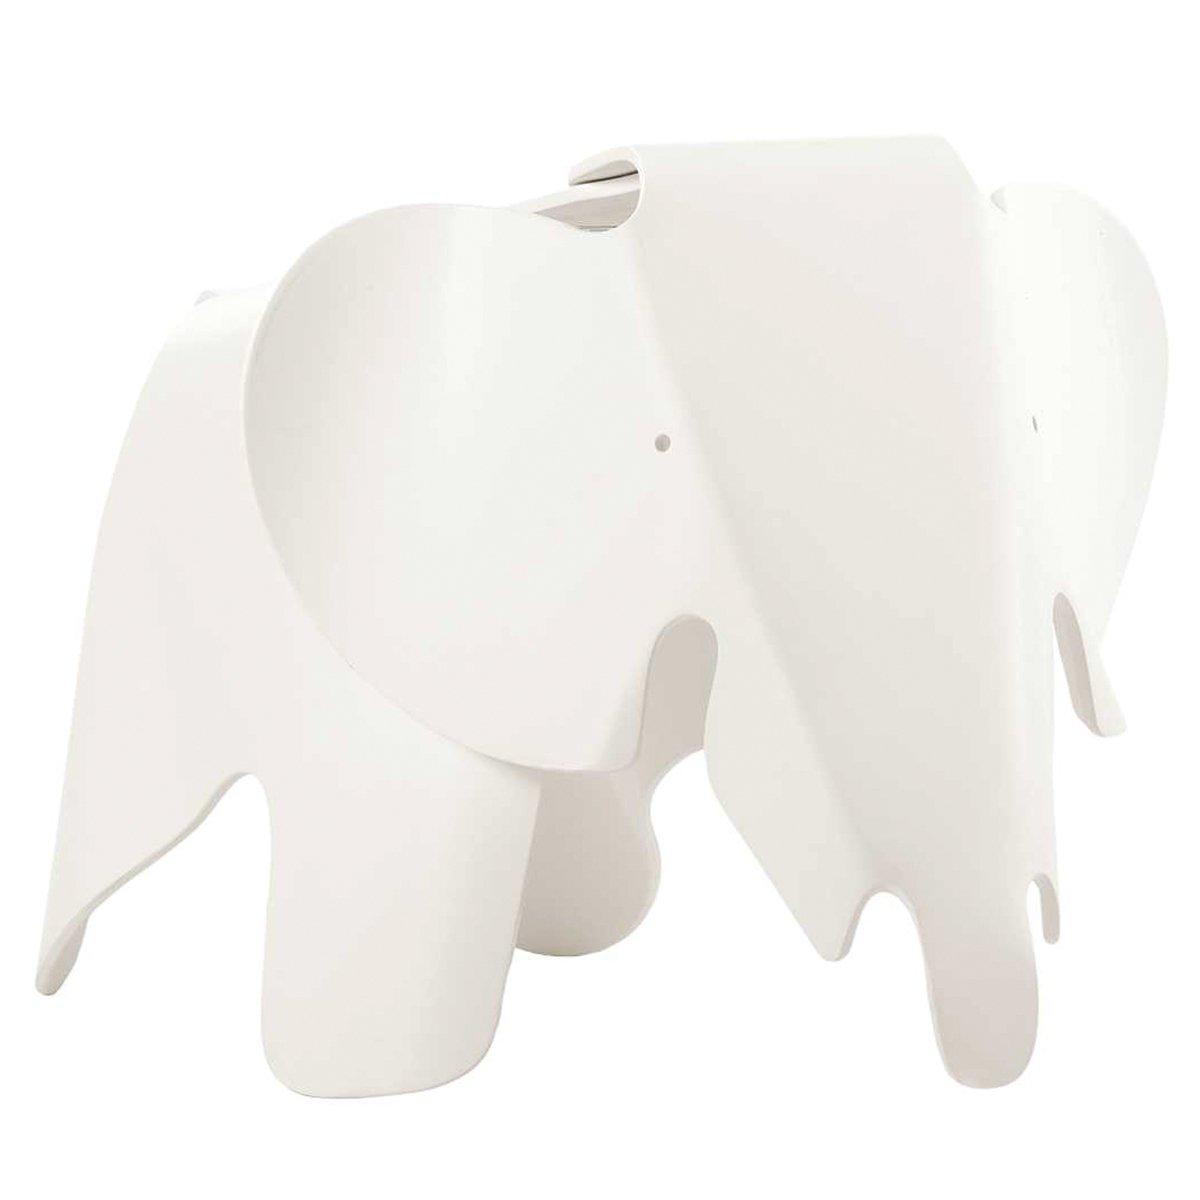 Vitra Elephant Kinderstoel Wit